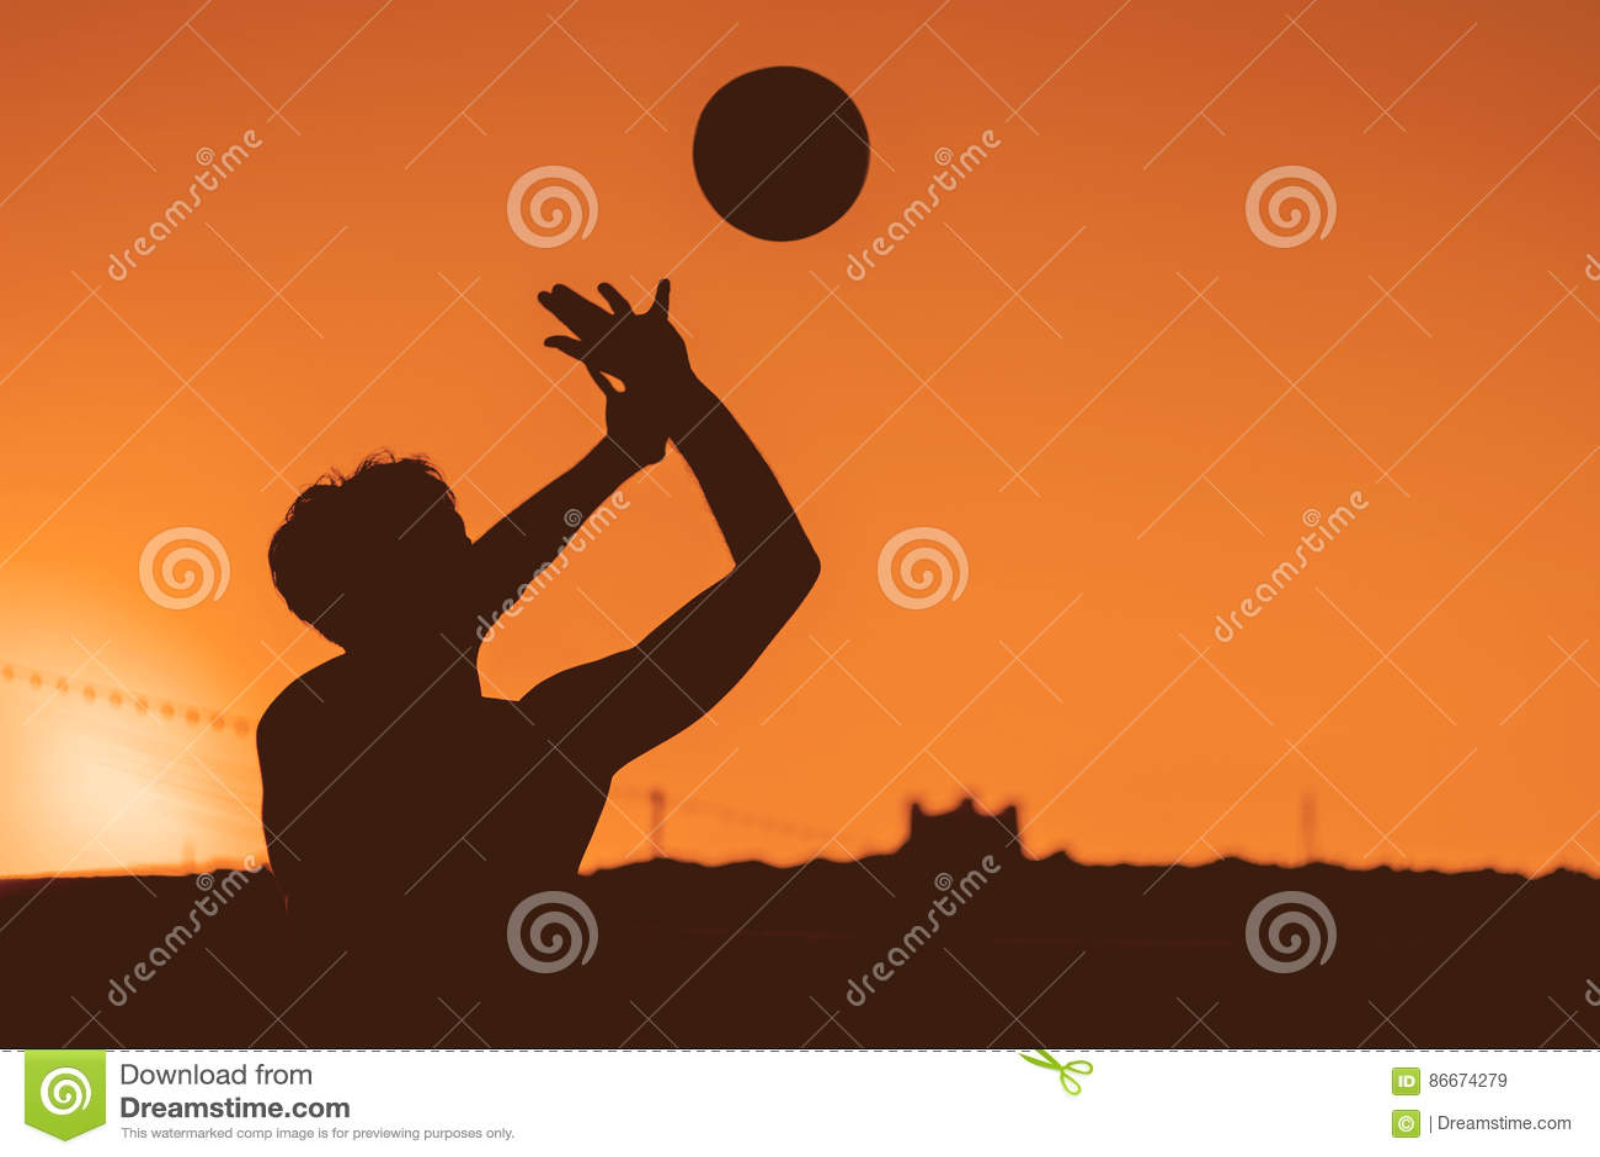 Indivíduo que bate o voleibol na imagem do estilo da sombra